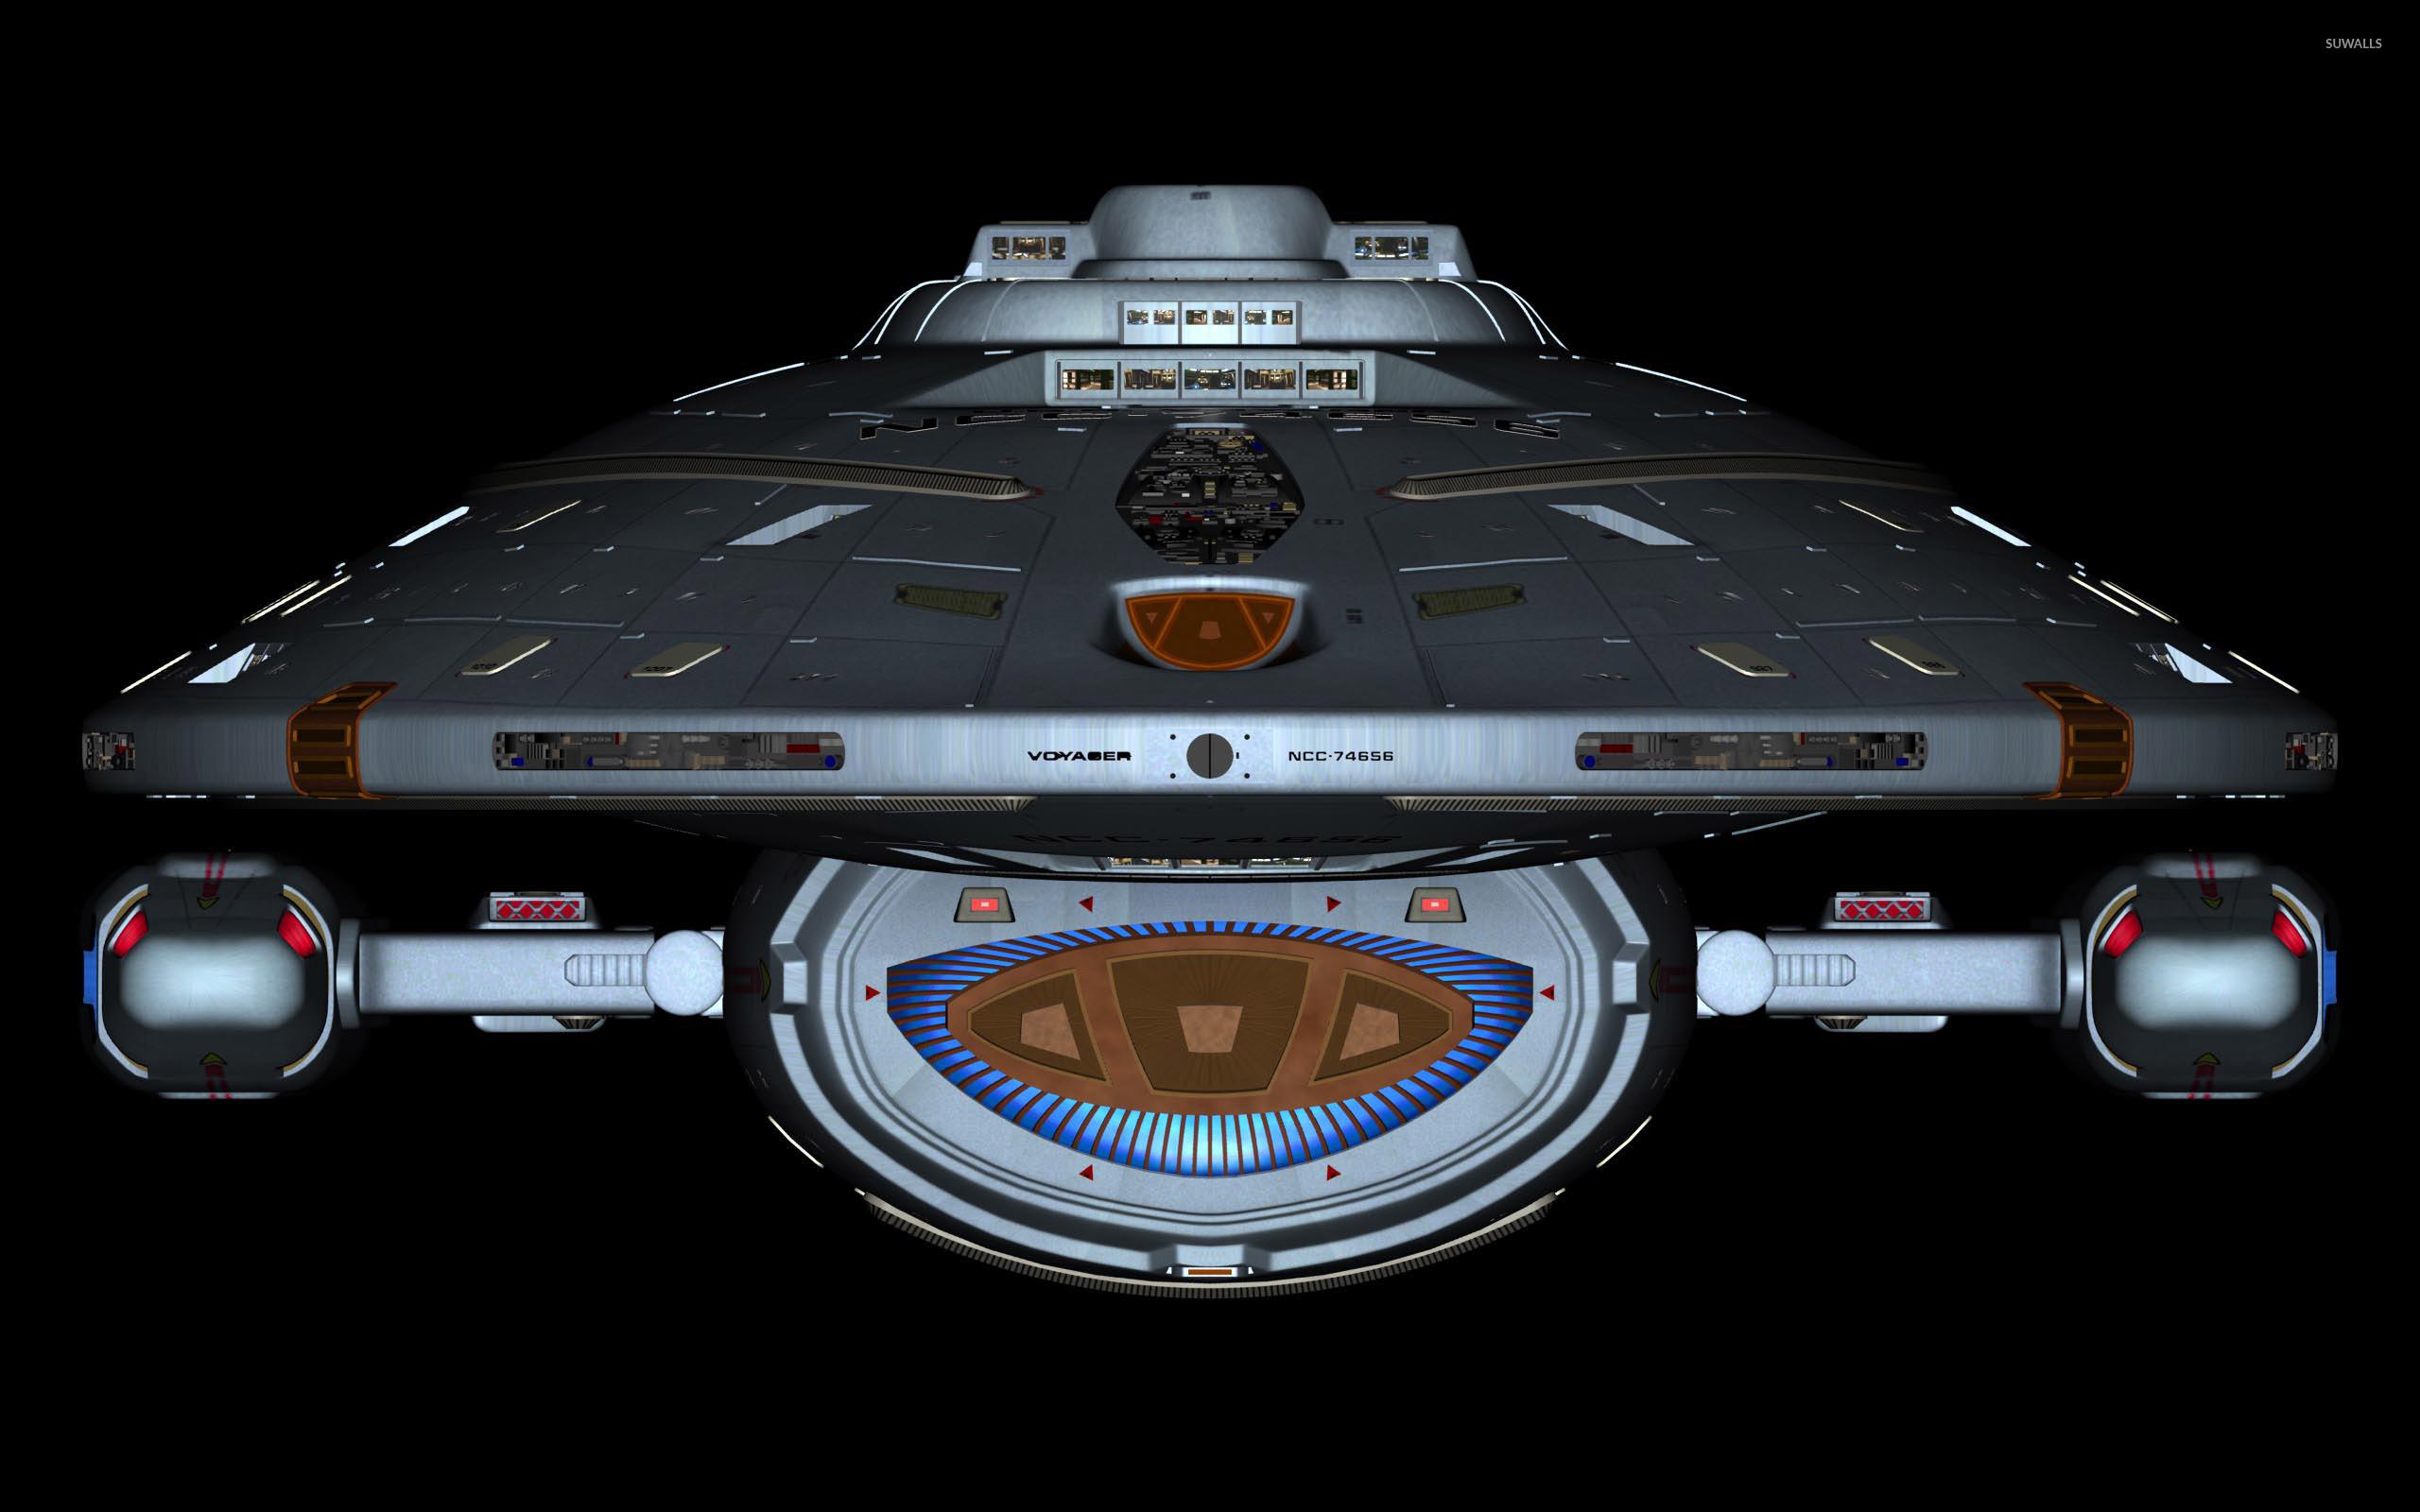 Uss Voyager Star Trek Wallpaper Movie Wallpapers 30115